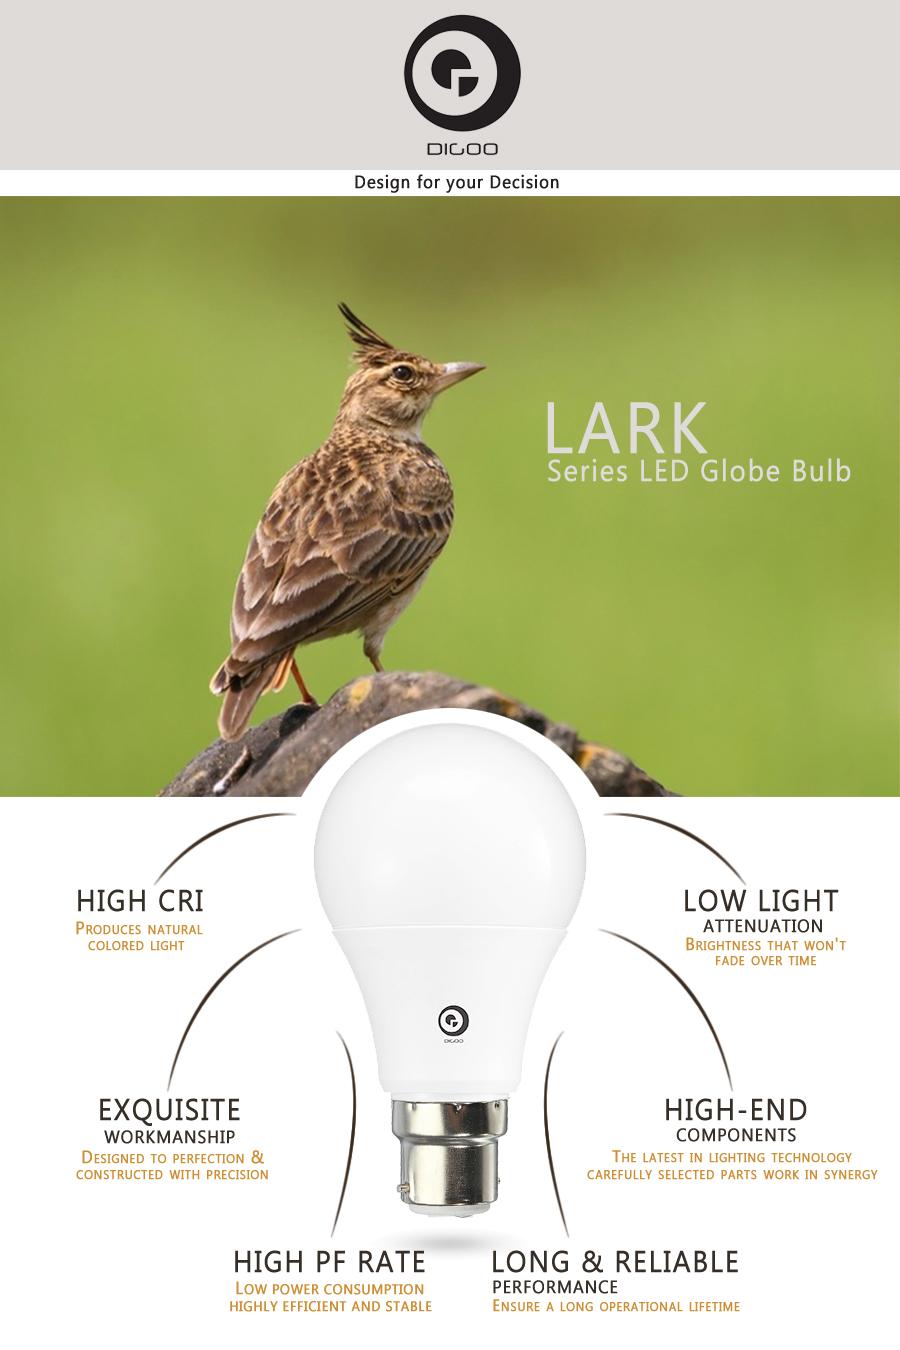 1X 5X 10X Digoo Lark Series Wholesale LED B22 High PF 3W 5W LED Globe Bulb AC85-265V